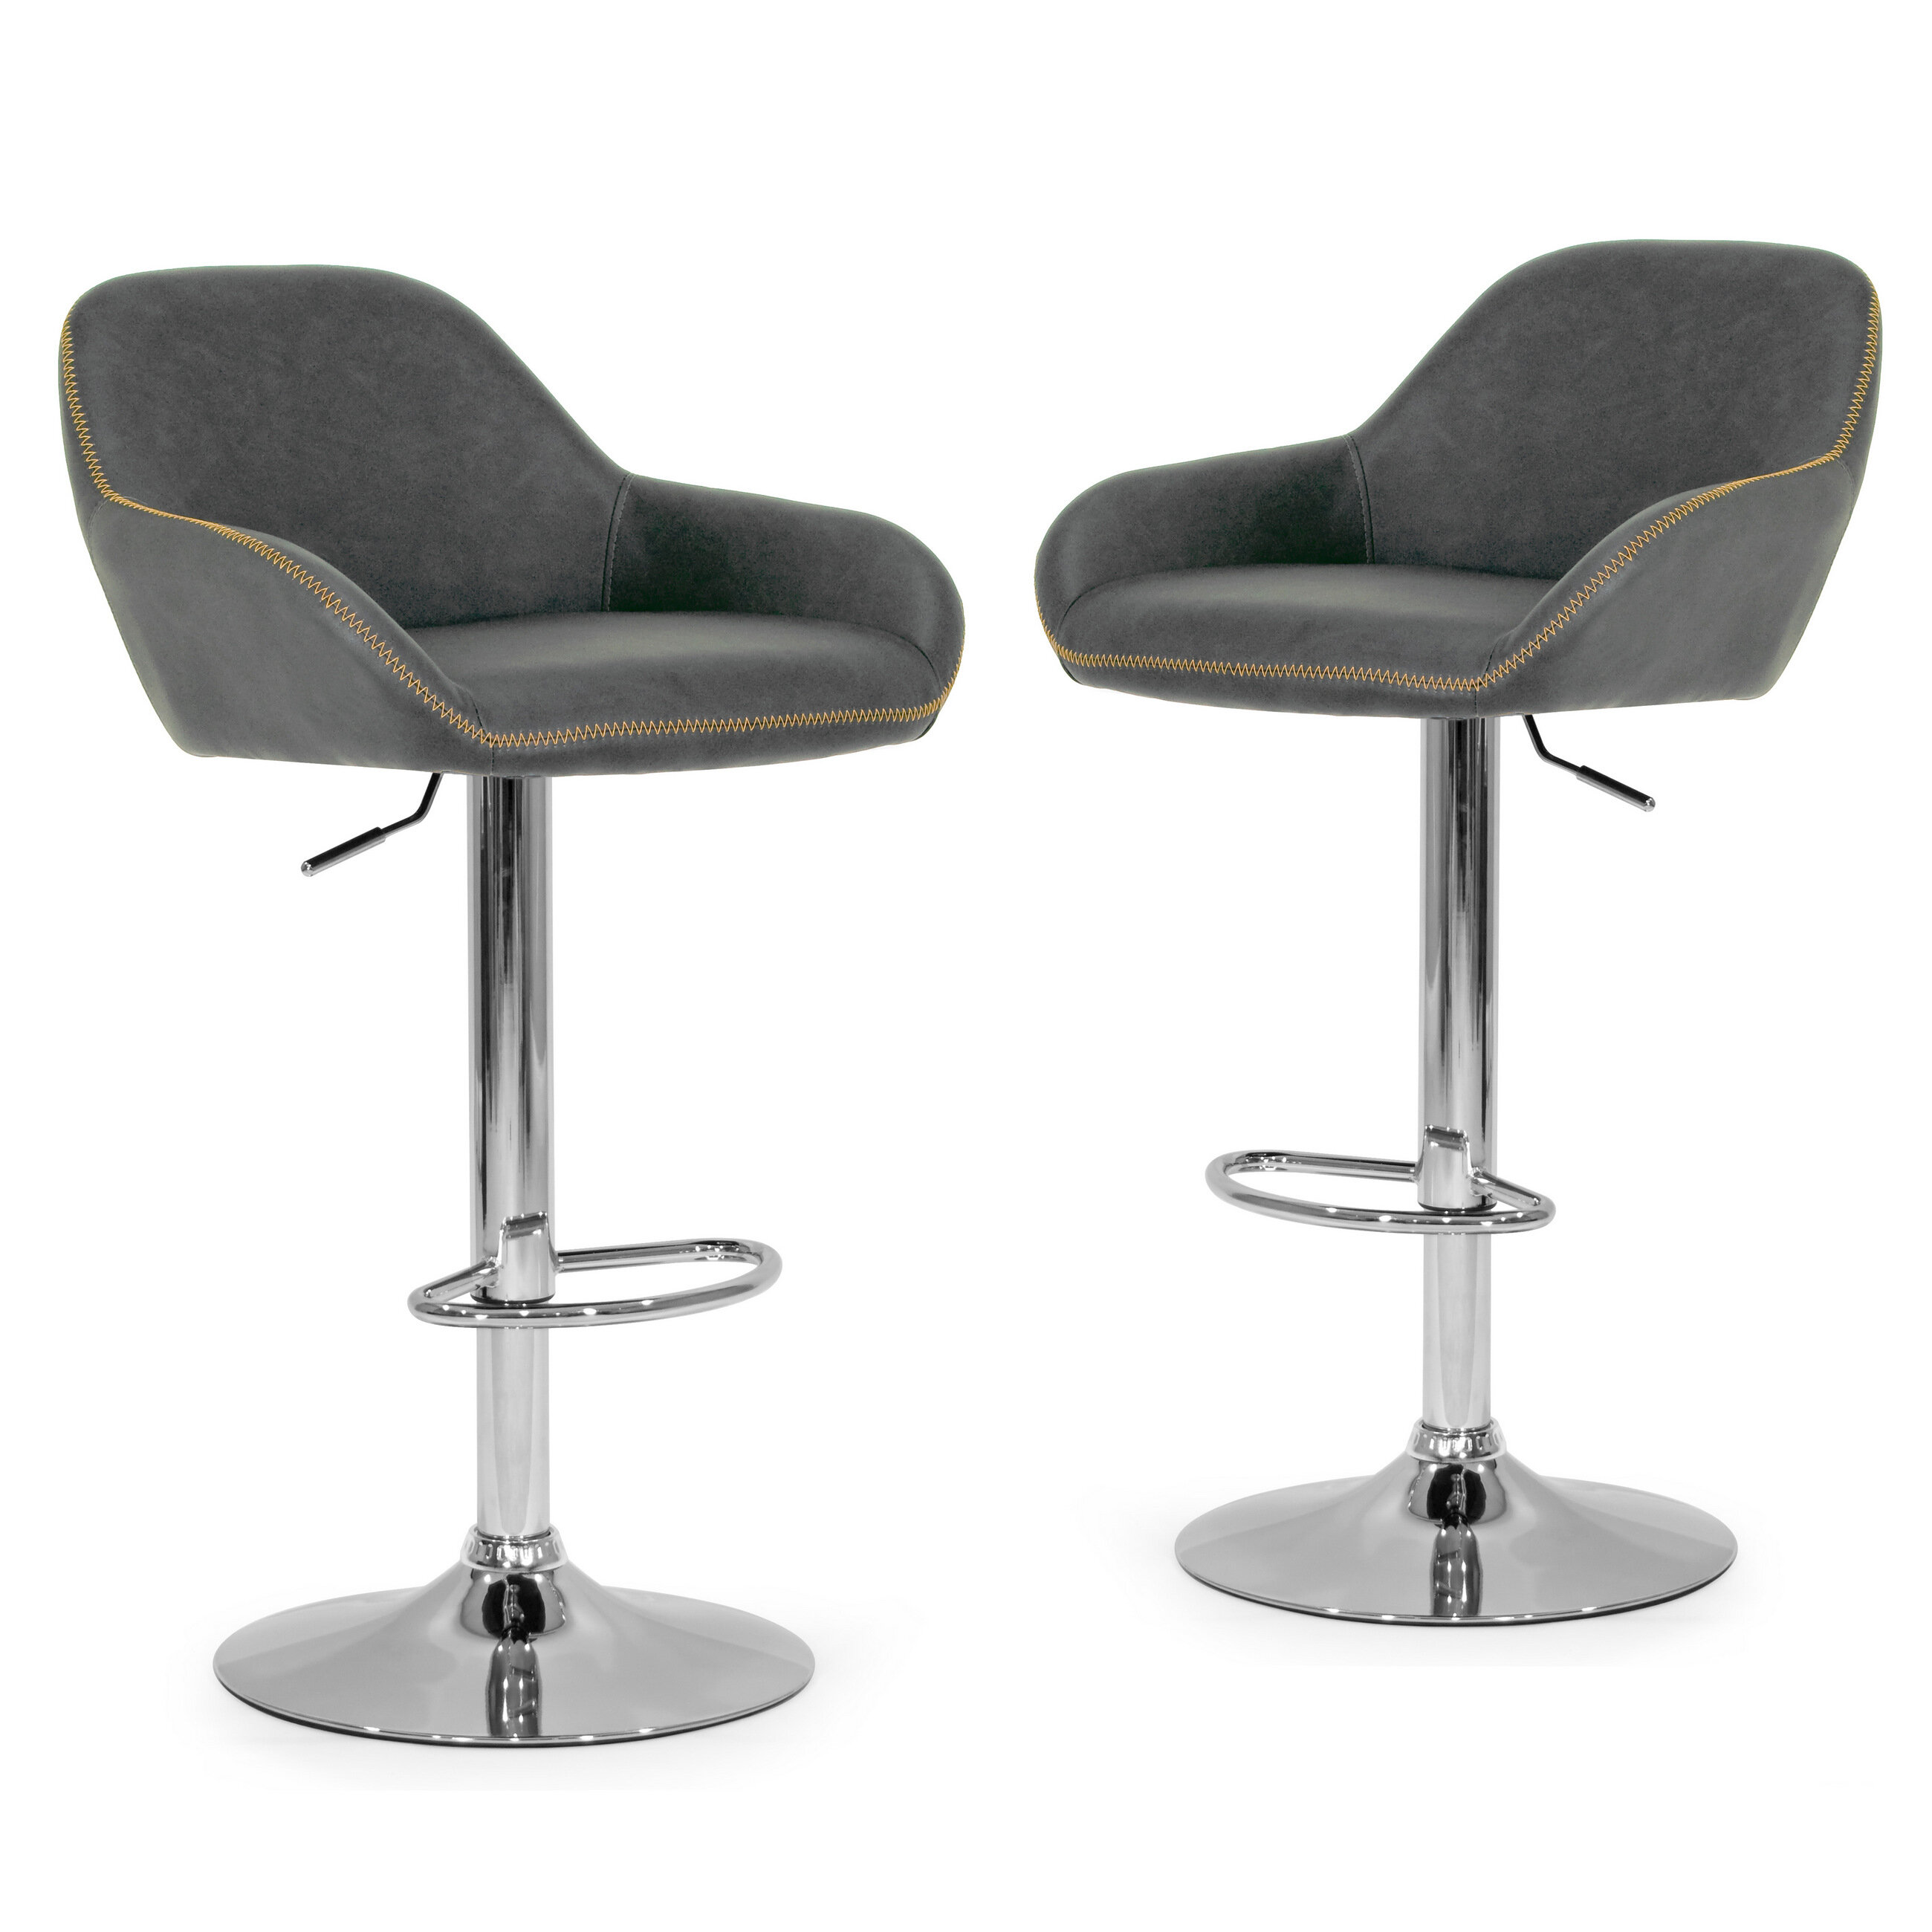 Superb Alan Adjustable Height Swivel Bar Stool Machost Co Dining Chair Design Ideas Machostcouk